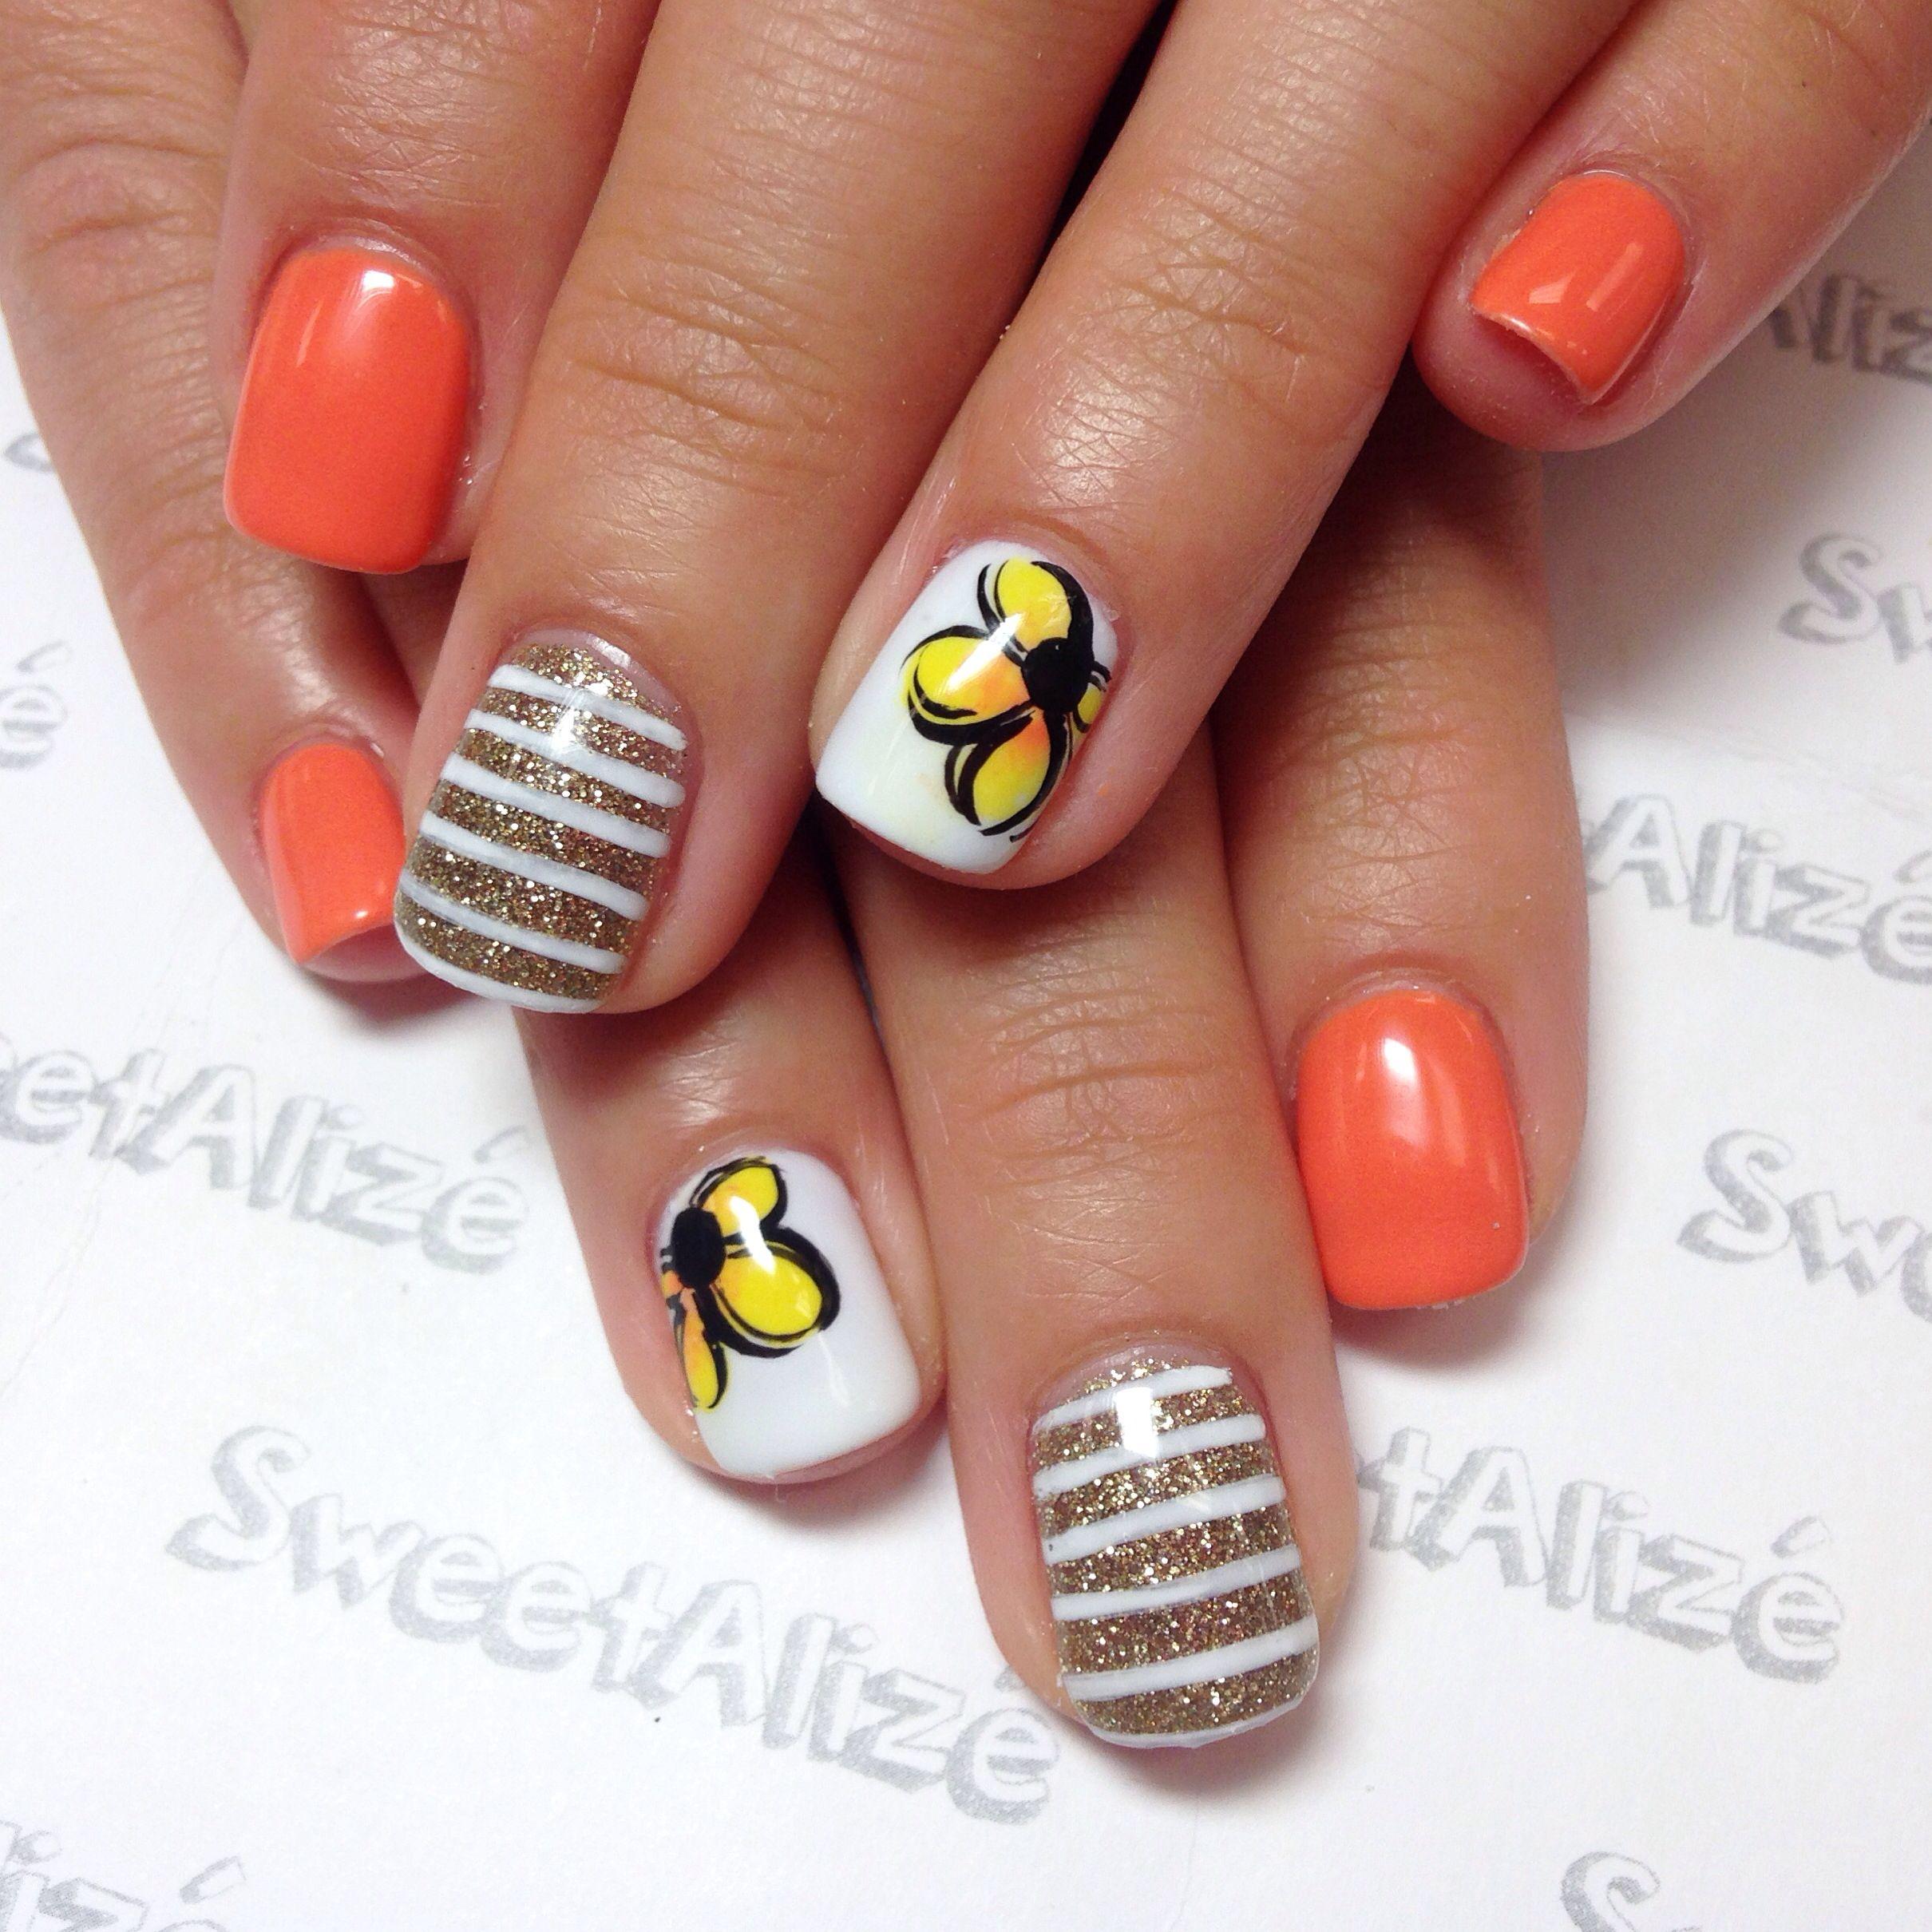 nails #nailart #naildesign #naildesigns #beauty #fashion #salon ...